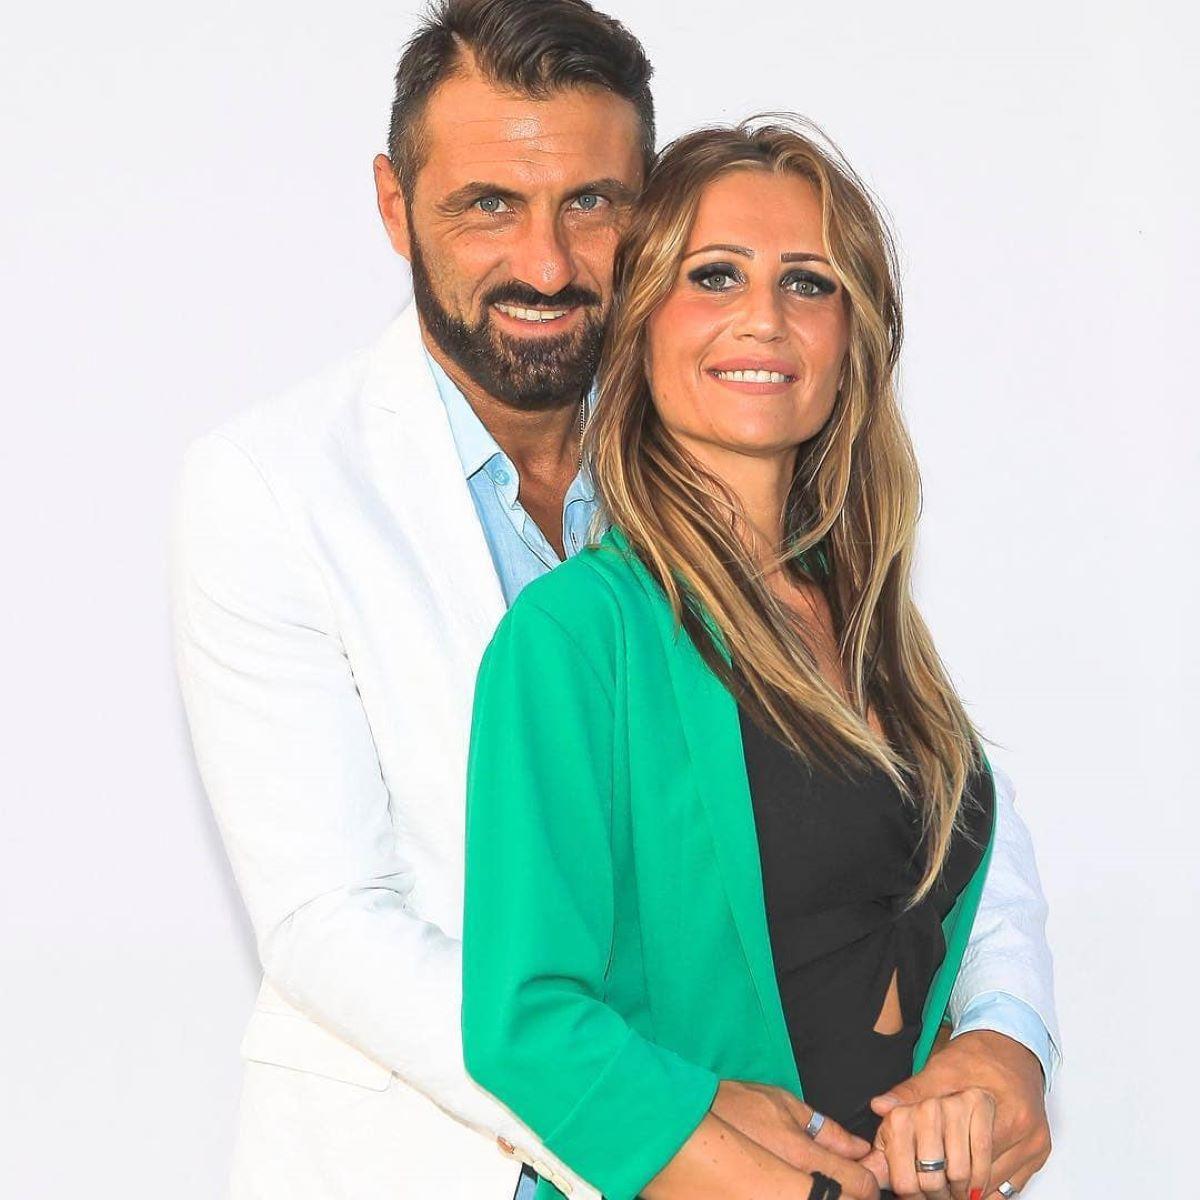 Sossio Aruta Ursula Bennardo Coronavirus Condizioni Salute